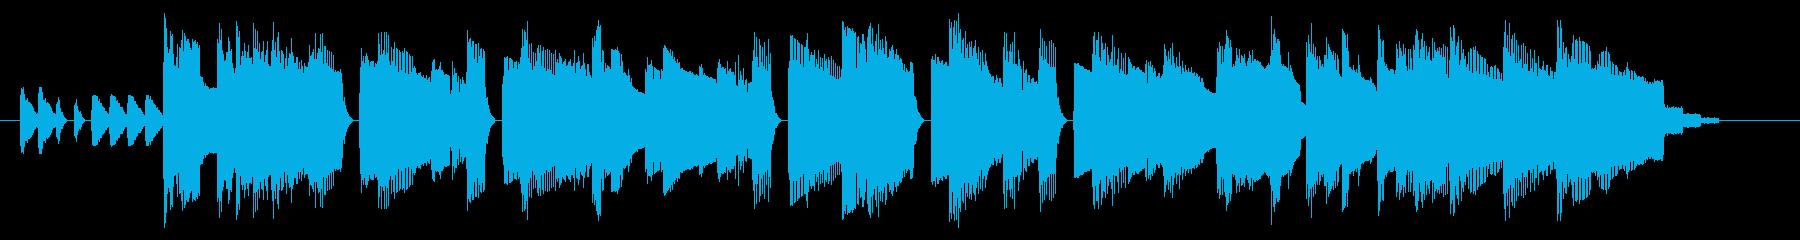 NES アクションD01-1(タイトル1の再生済みの波形